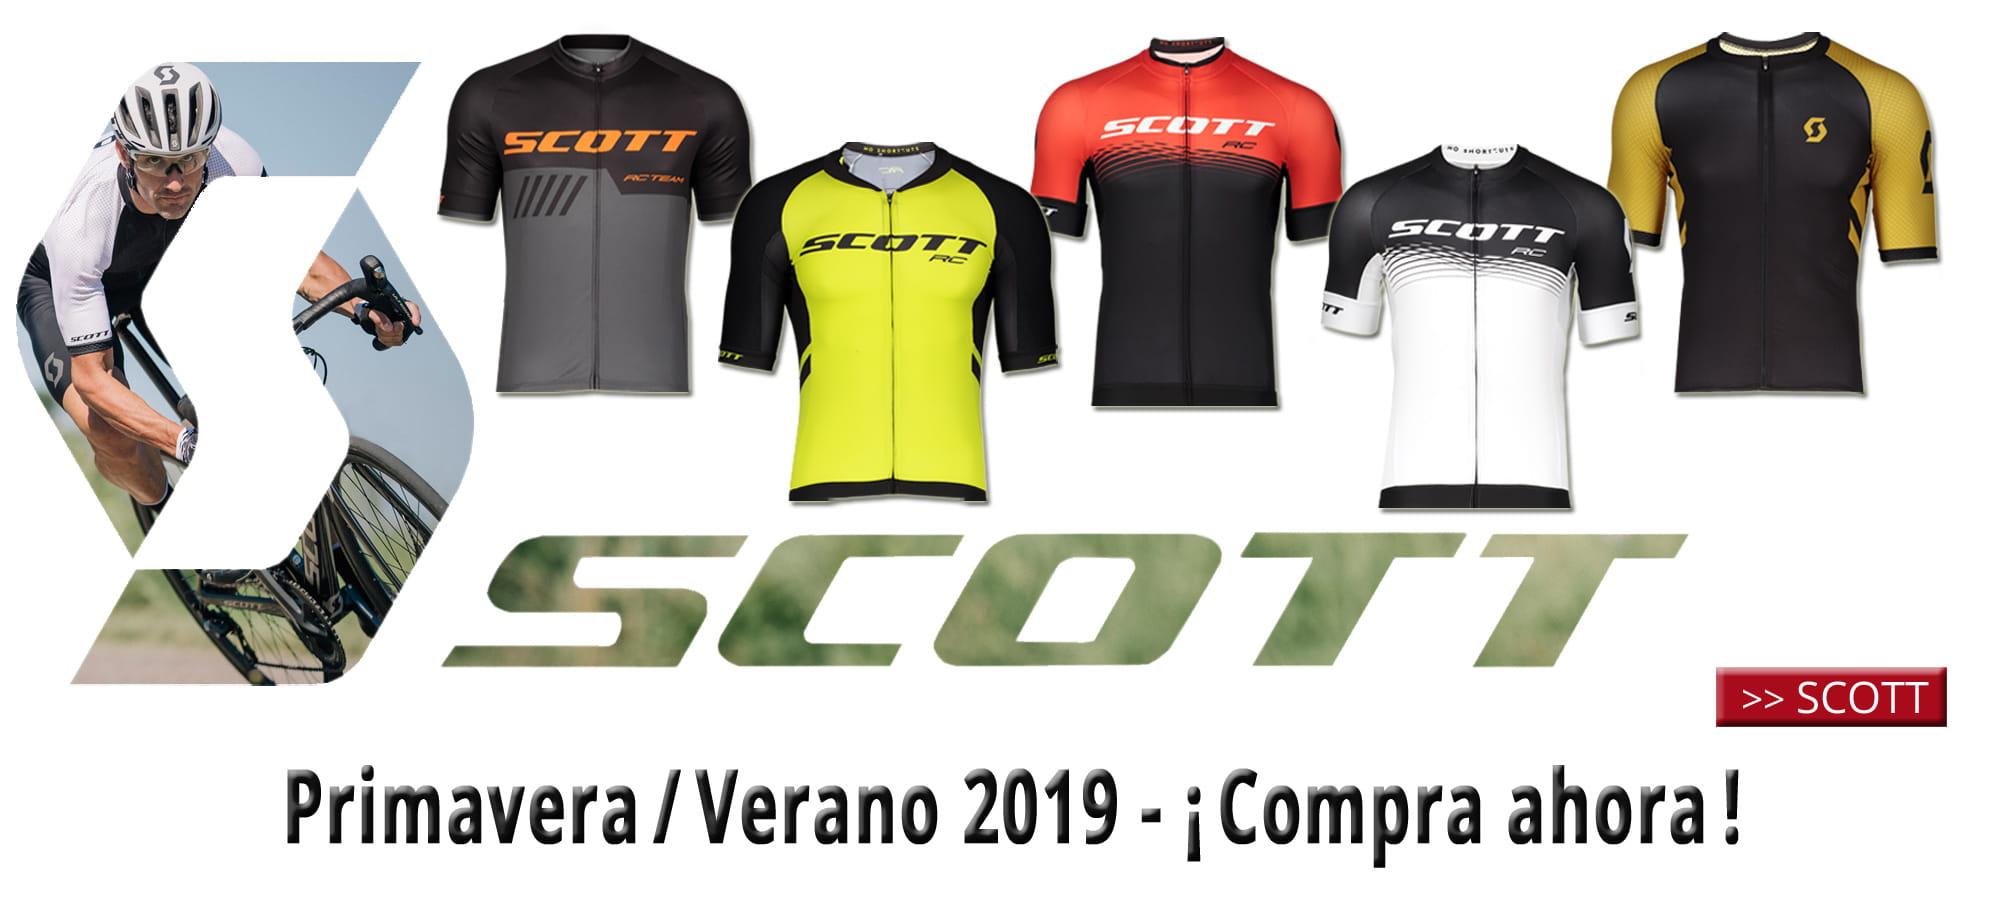 Scott primavera / verano 2019 - ahora disponible